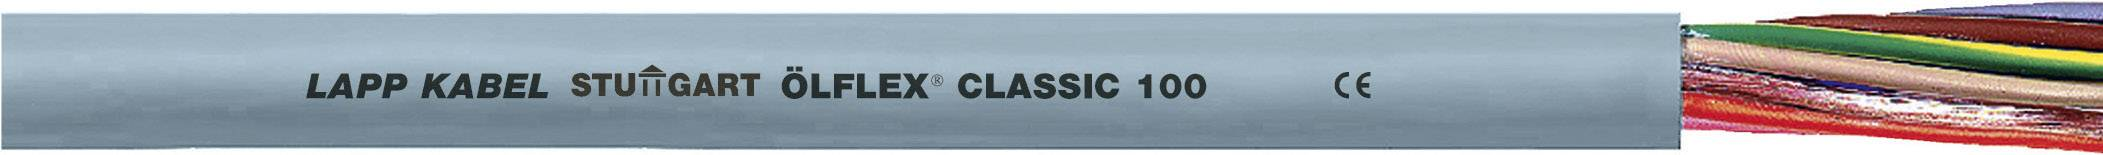 Kabel LappKabel Ölflex CLASSIC 100 8G2,5 (0010092), PVC, 15,8 mm, 750 V, šedá, 50 m